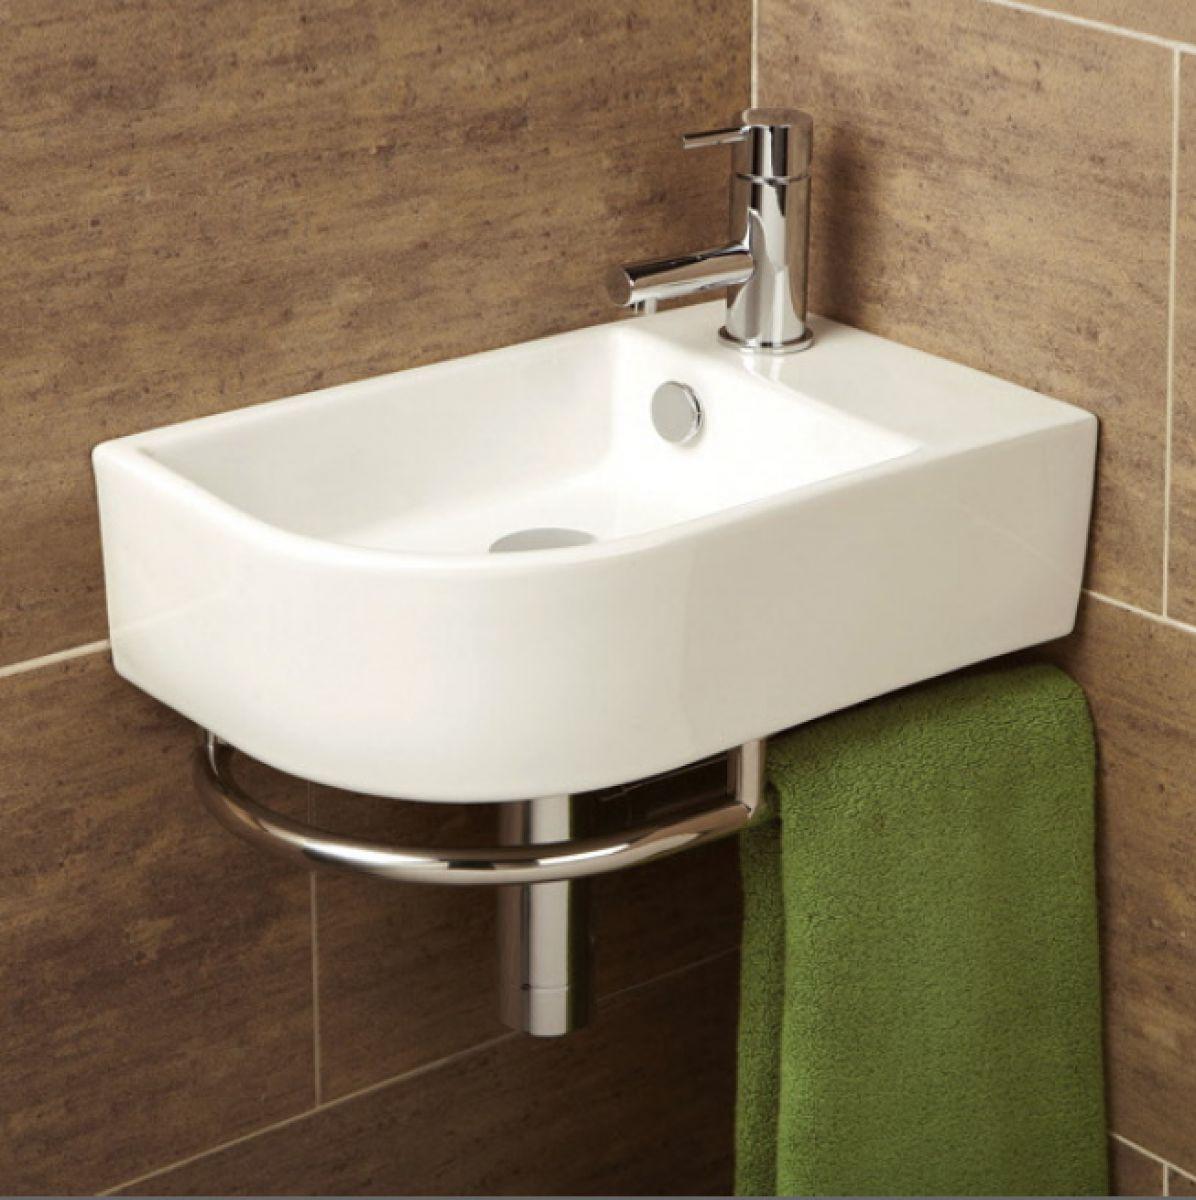 HIB Malo Temoli Contemporary Washbasin | Ideas for the House ...